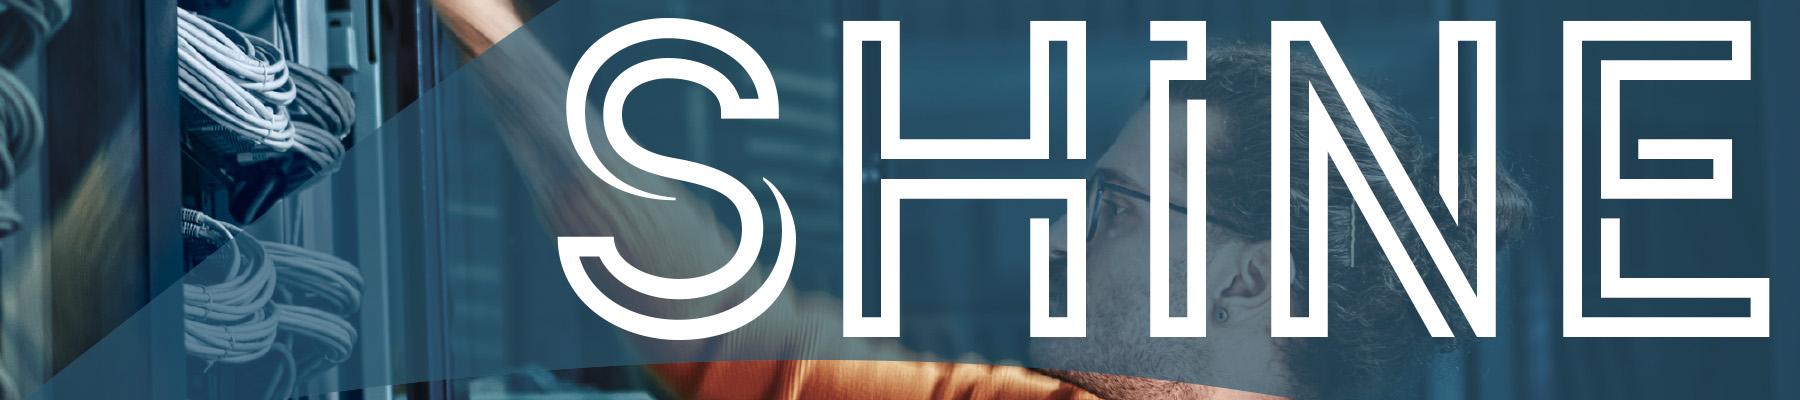 Shine catalog cover image